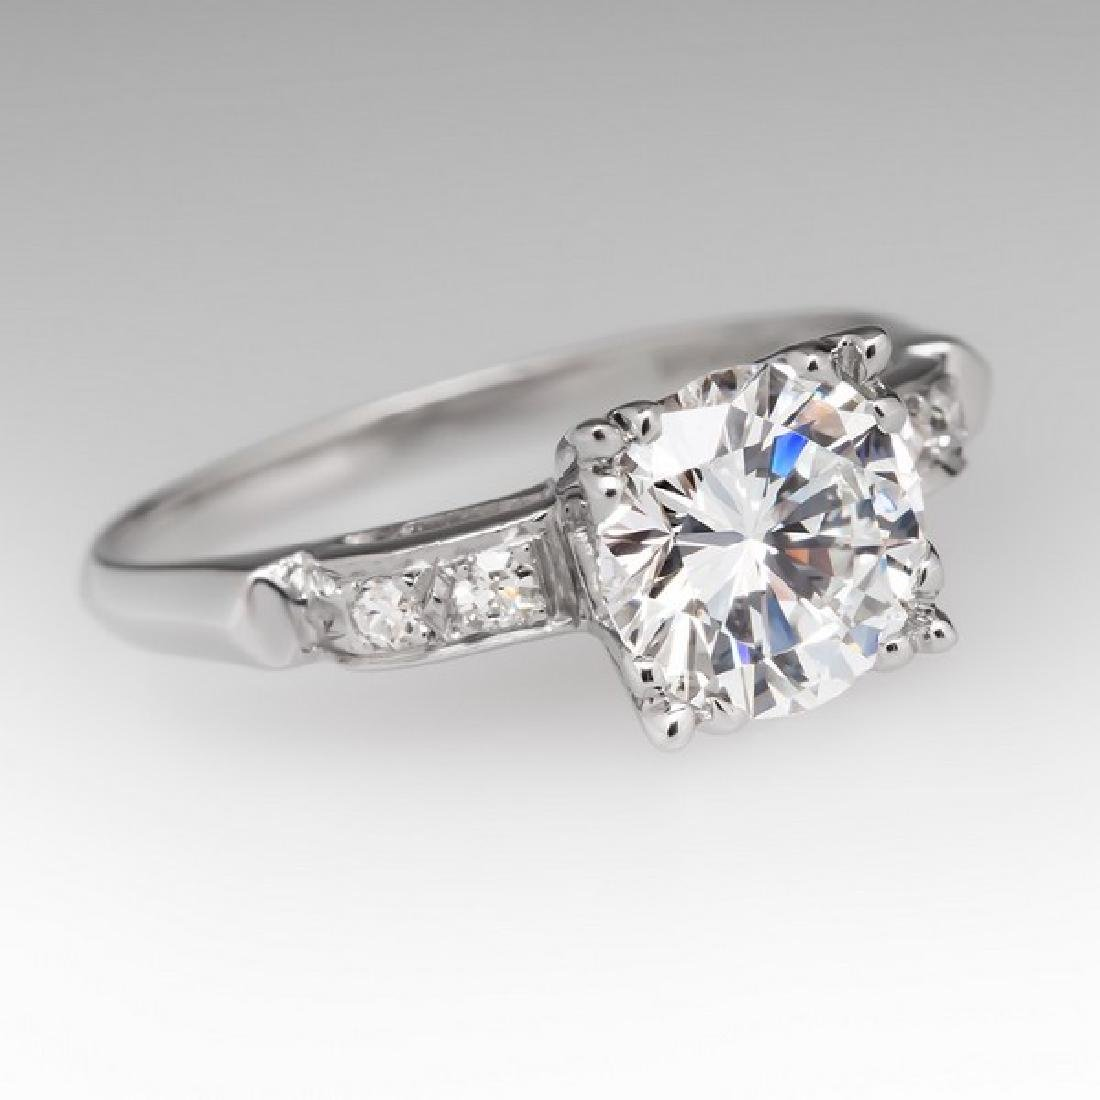 VINTAGE PLATINUM GIA DIAMOND ENGAGEMENT RING - 2